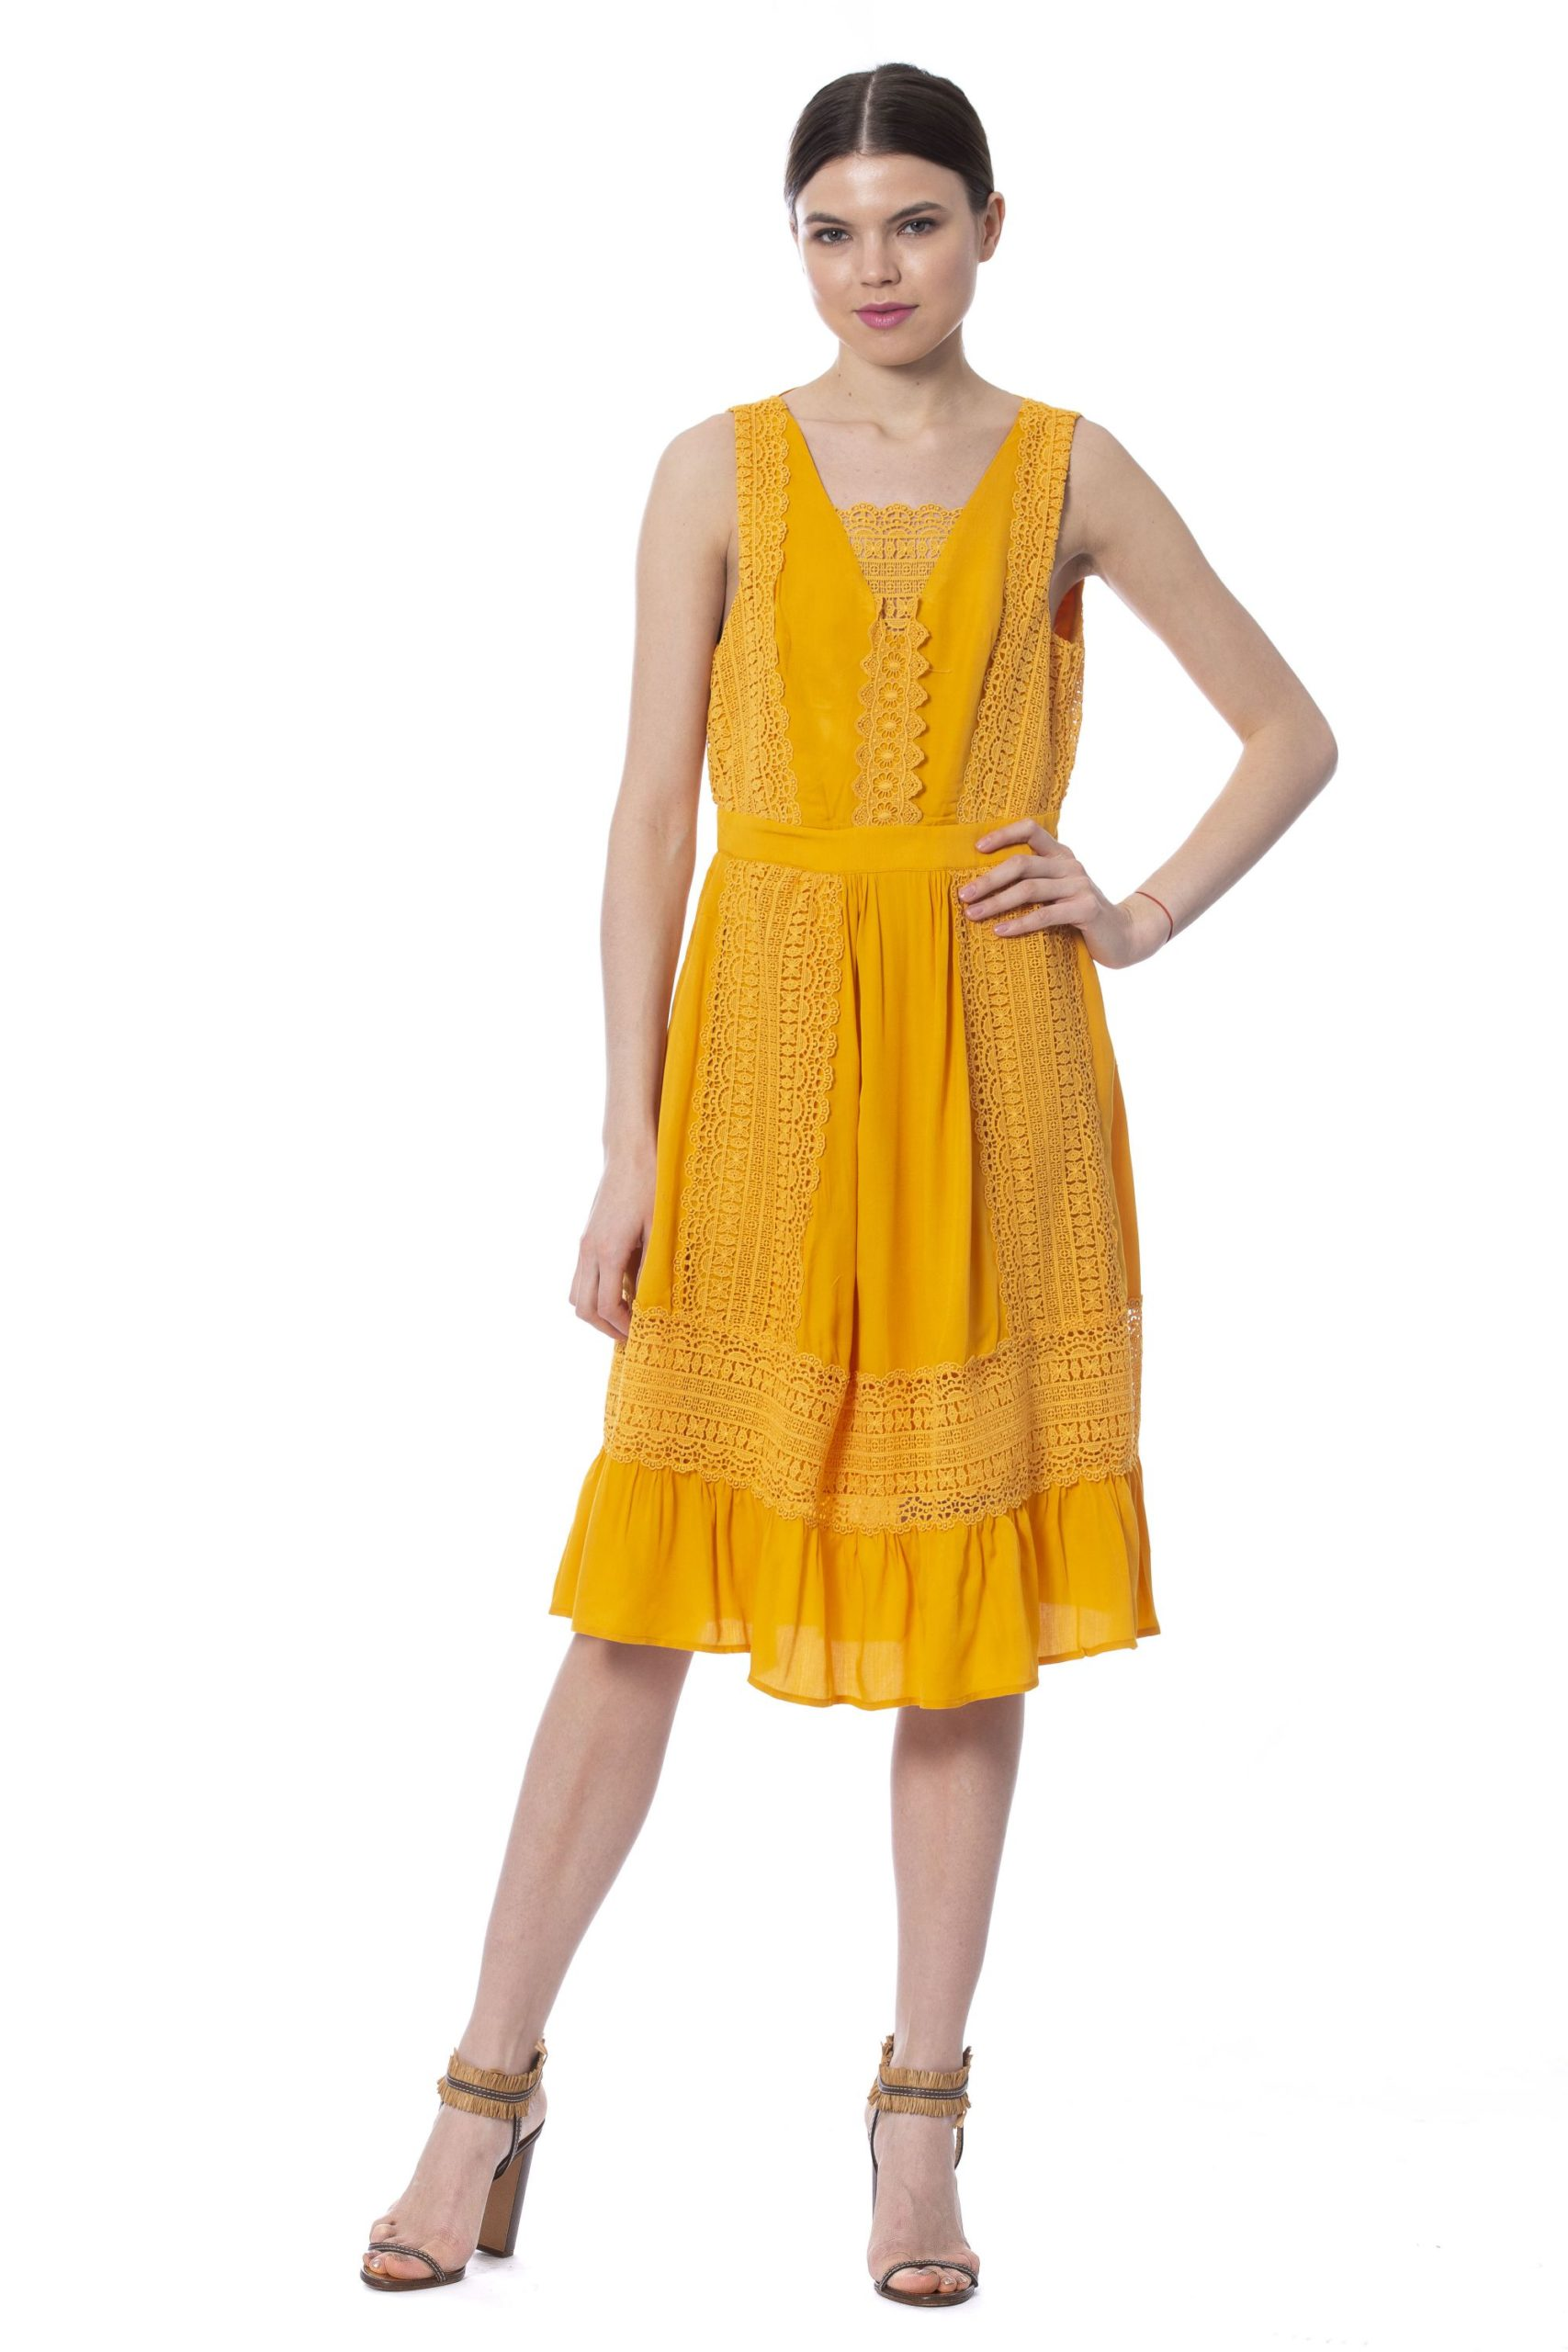 Silvian Heach Women's Dress Yellow SI992434 - S